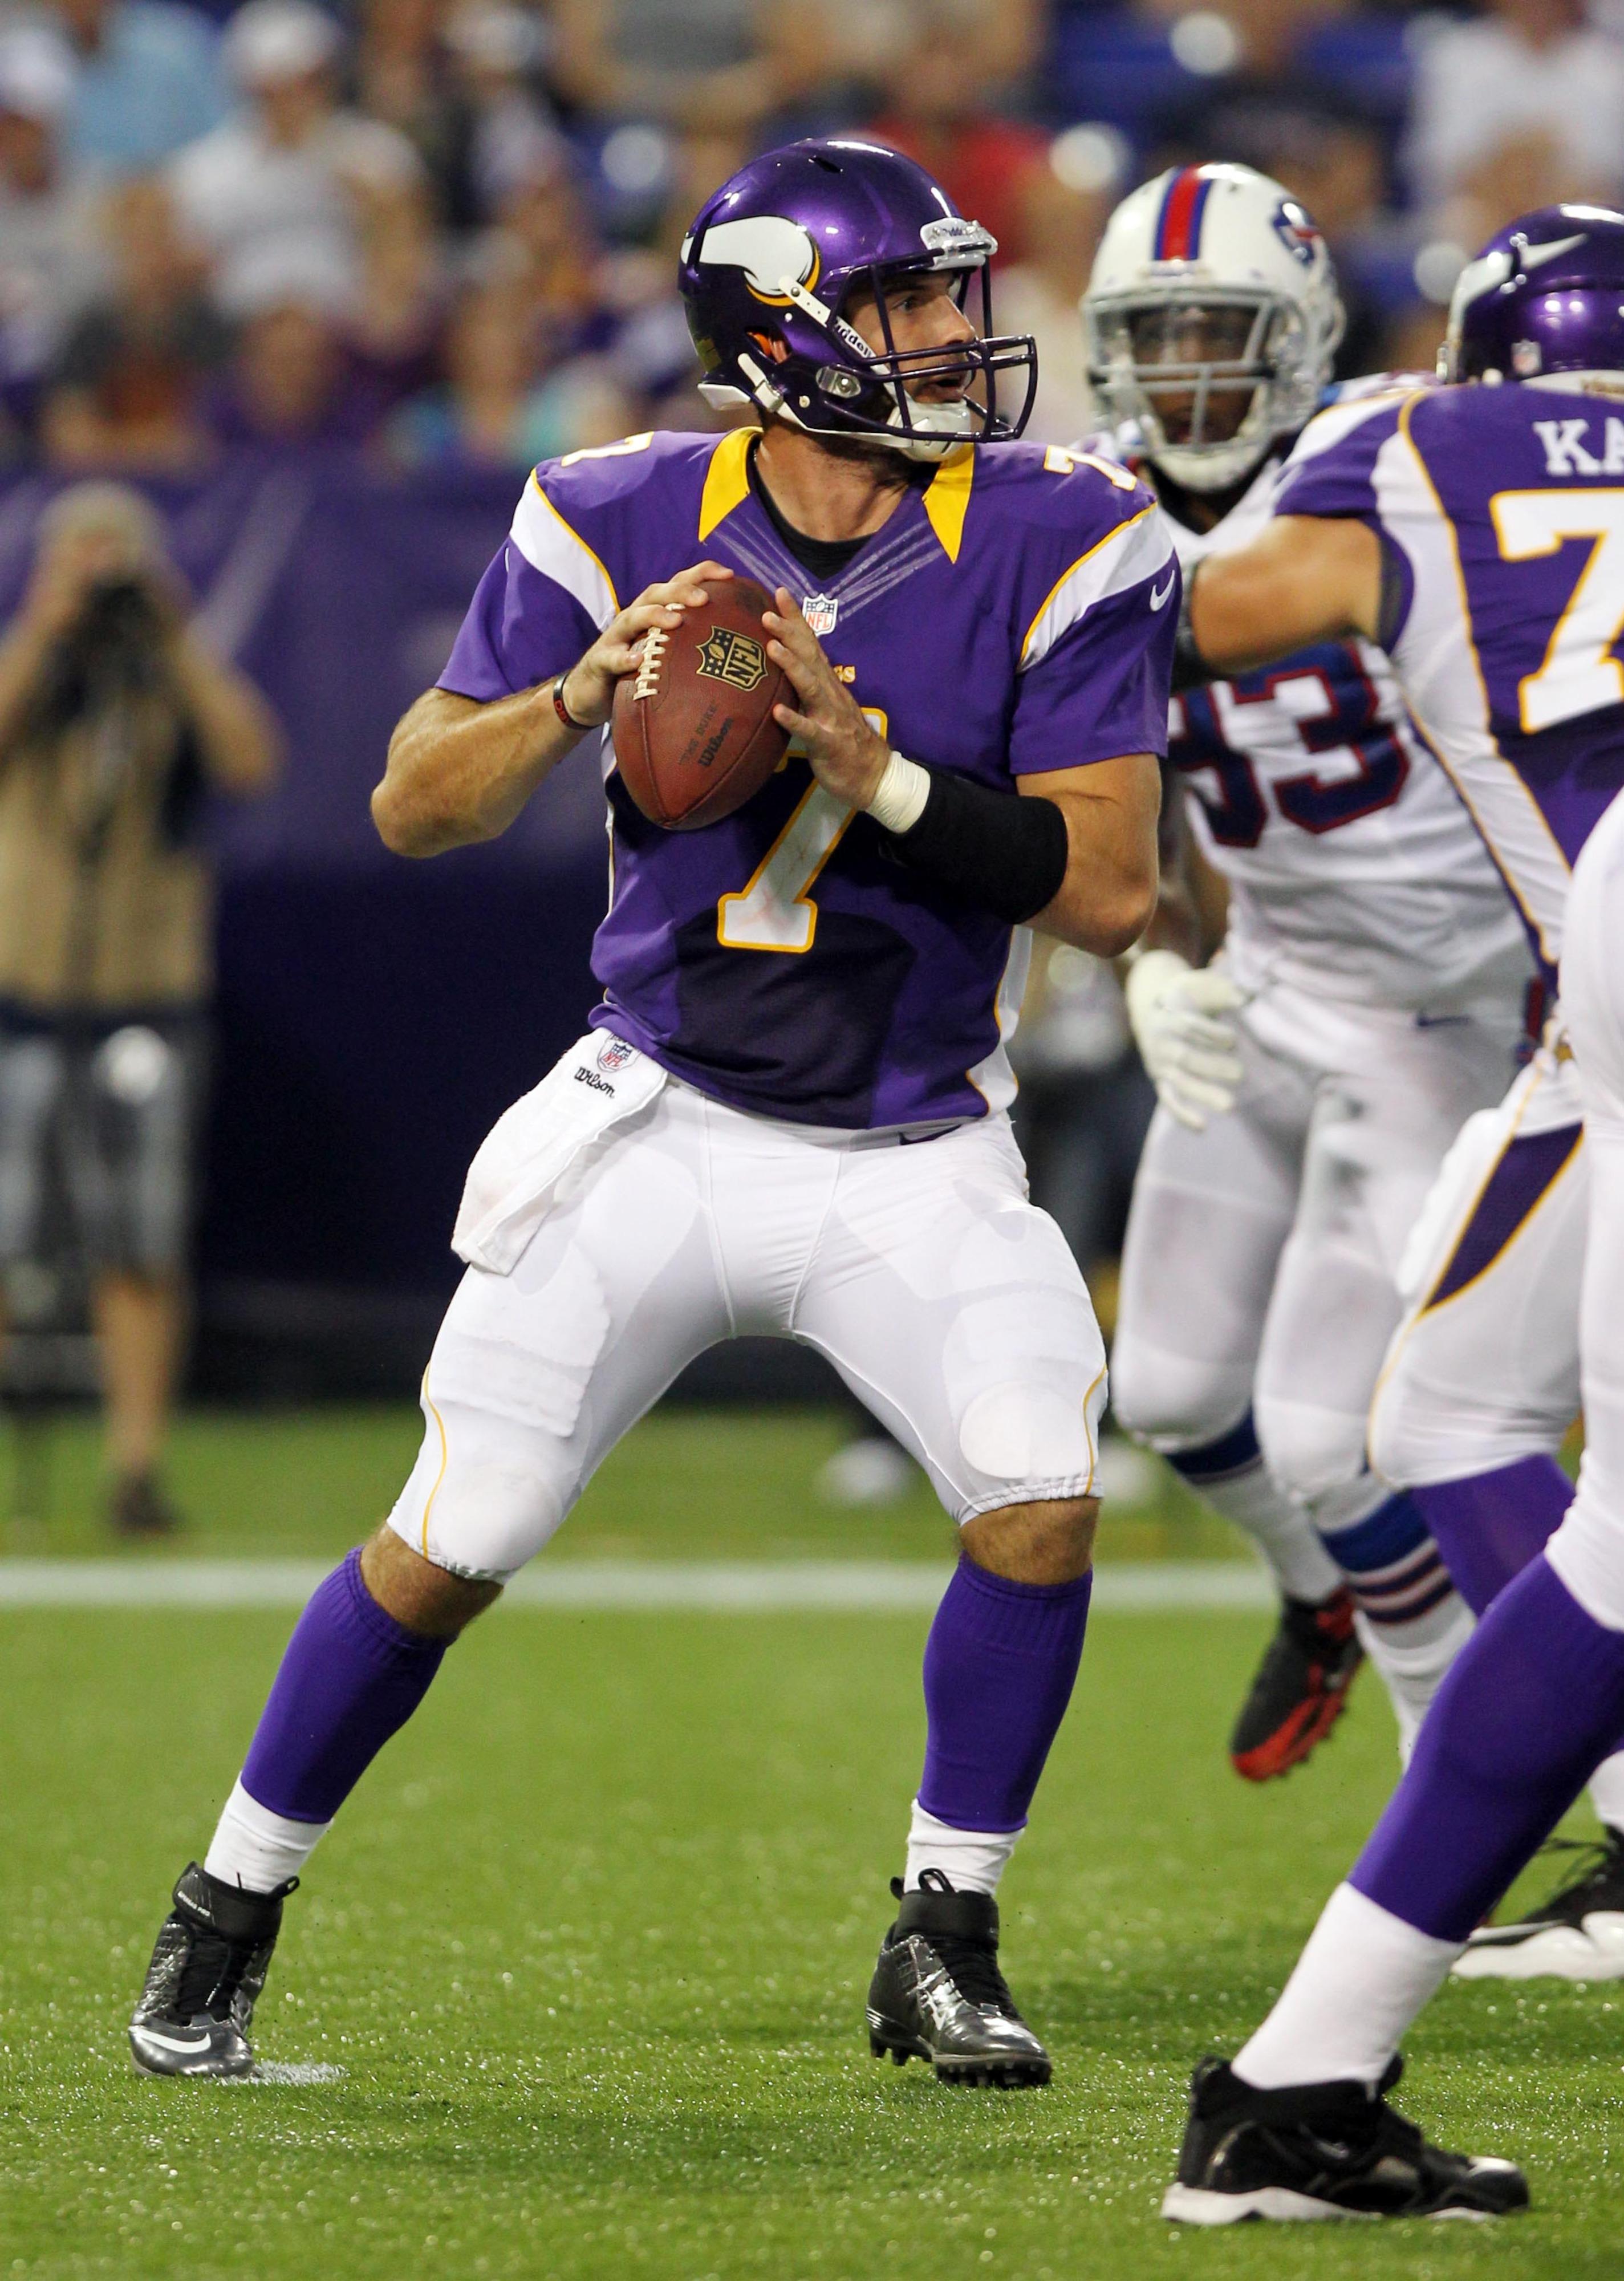 Aug 17, 2012; Minneapolis, MN, USA; Minnesota Vikings quarterback Christian Ponder (7) throws during the second quarter against the Buffalo Bills at the Metrodome. Mandatory Credit: Brace Hemmelgarn-US PRESSWIRE